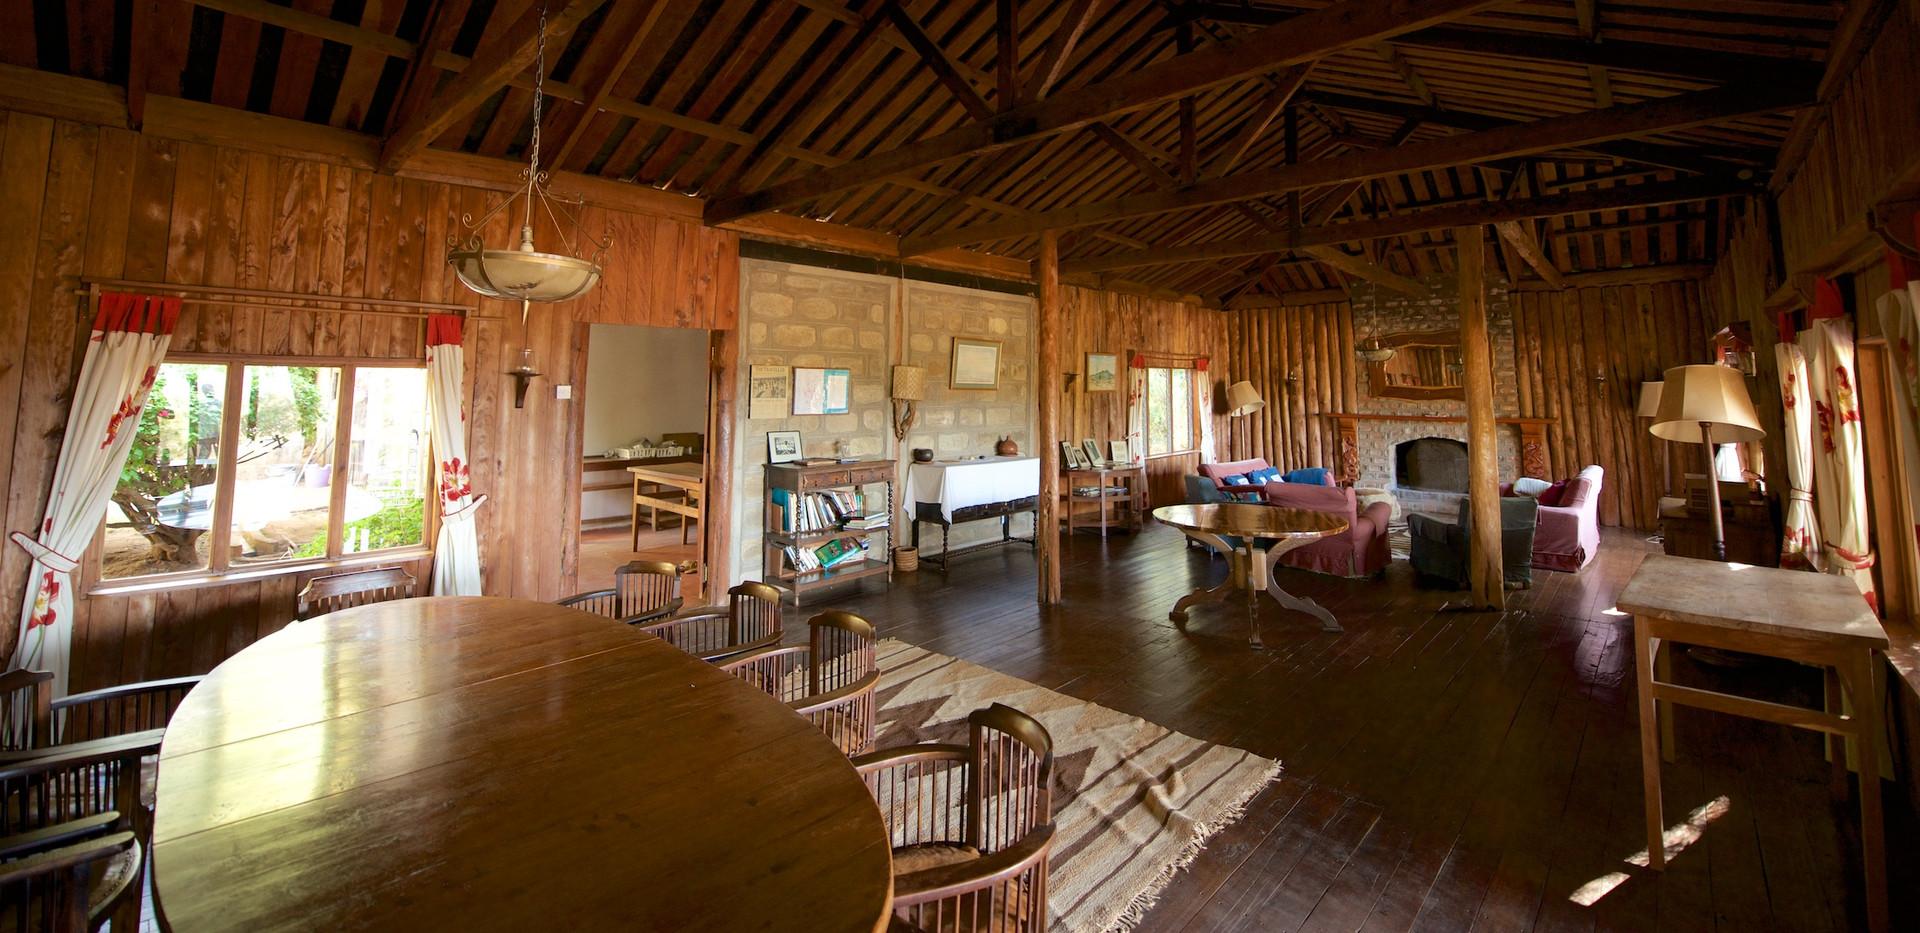 Lolldaiga-guesthouse-1095.jpg